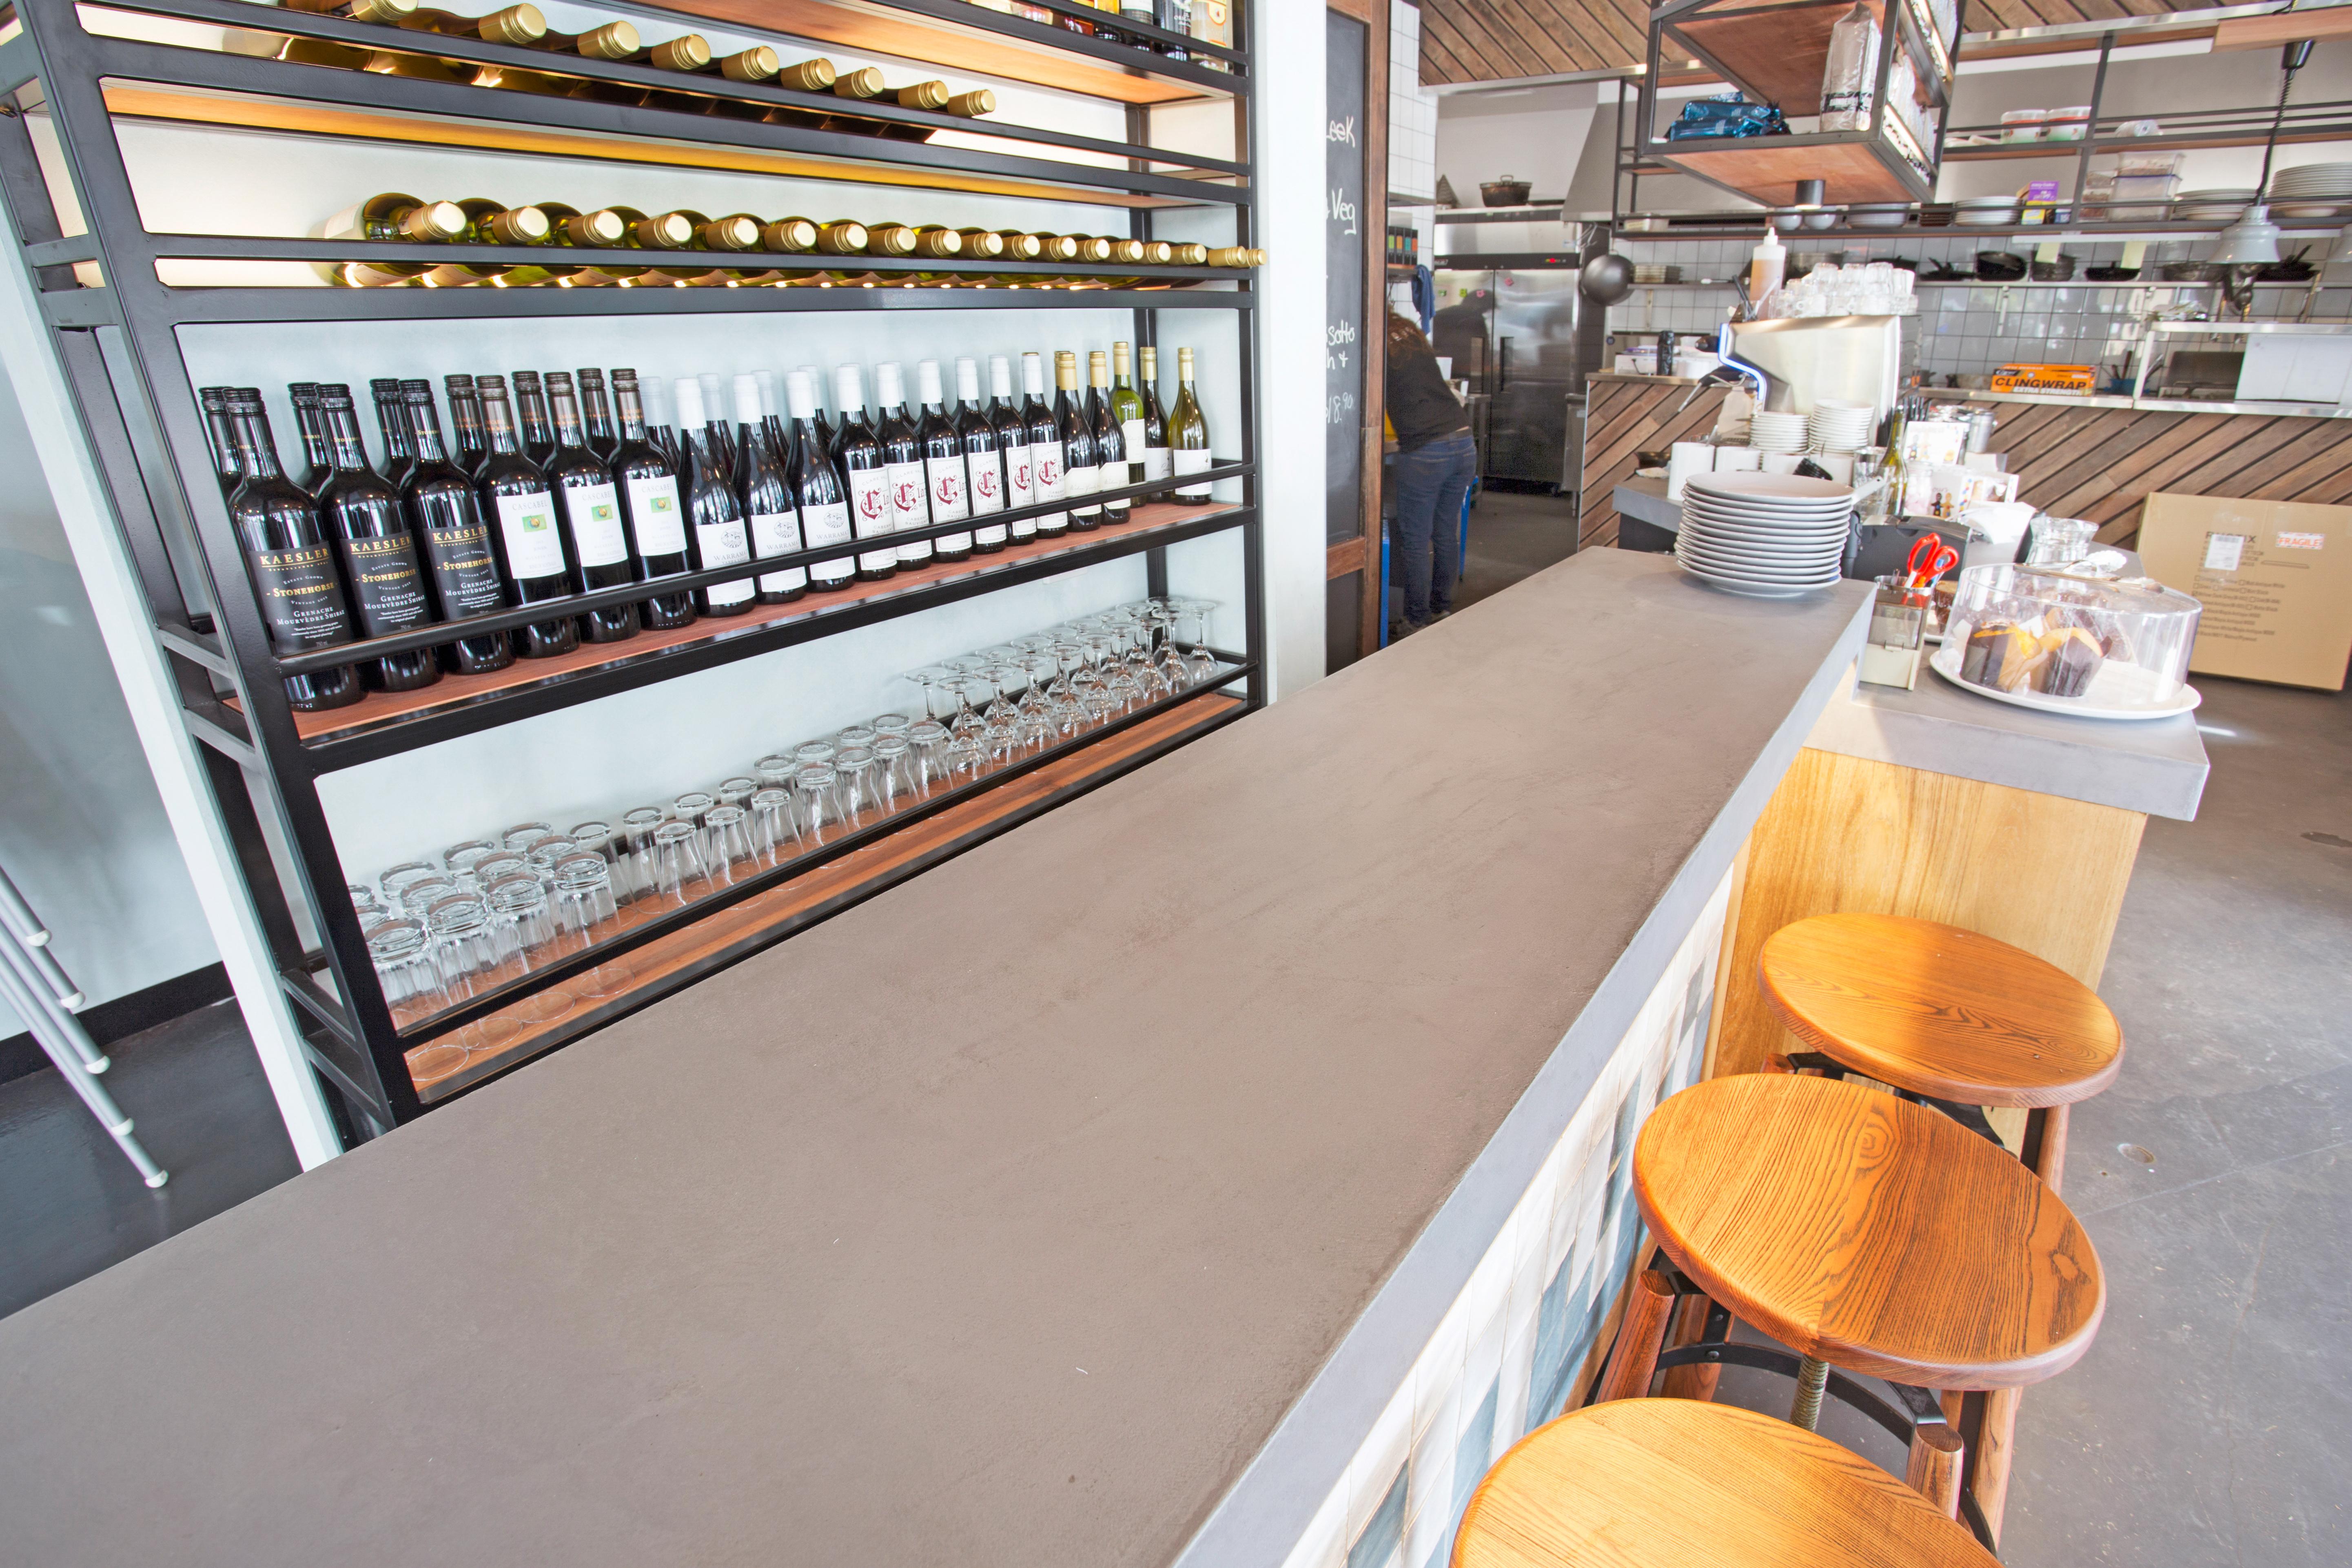 Cafe Bondi joinery